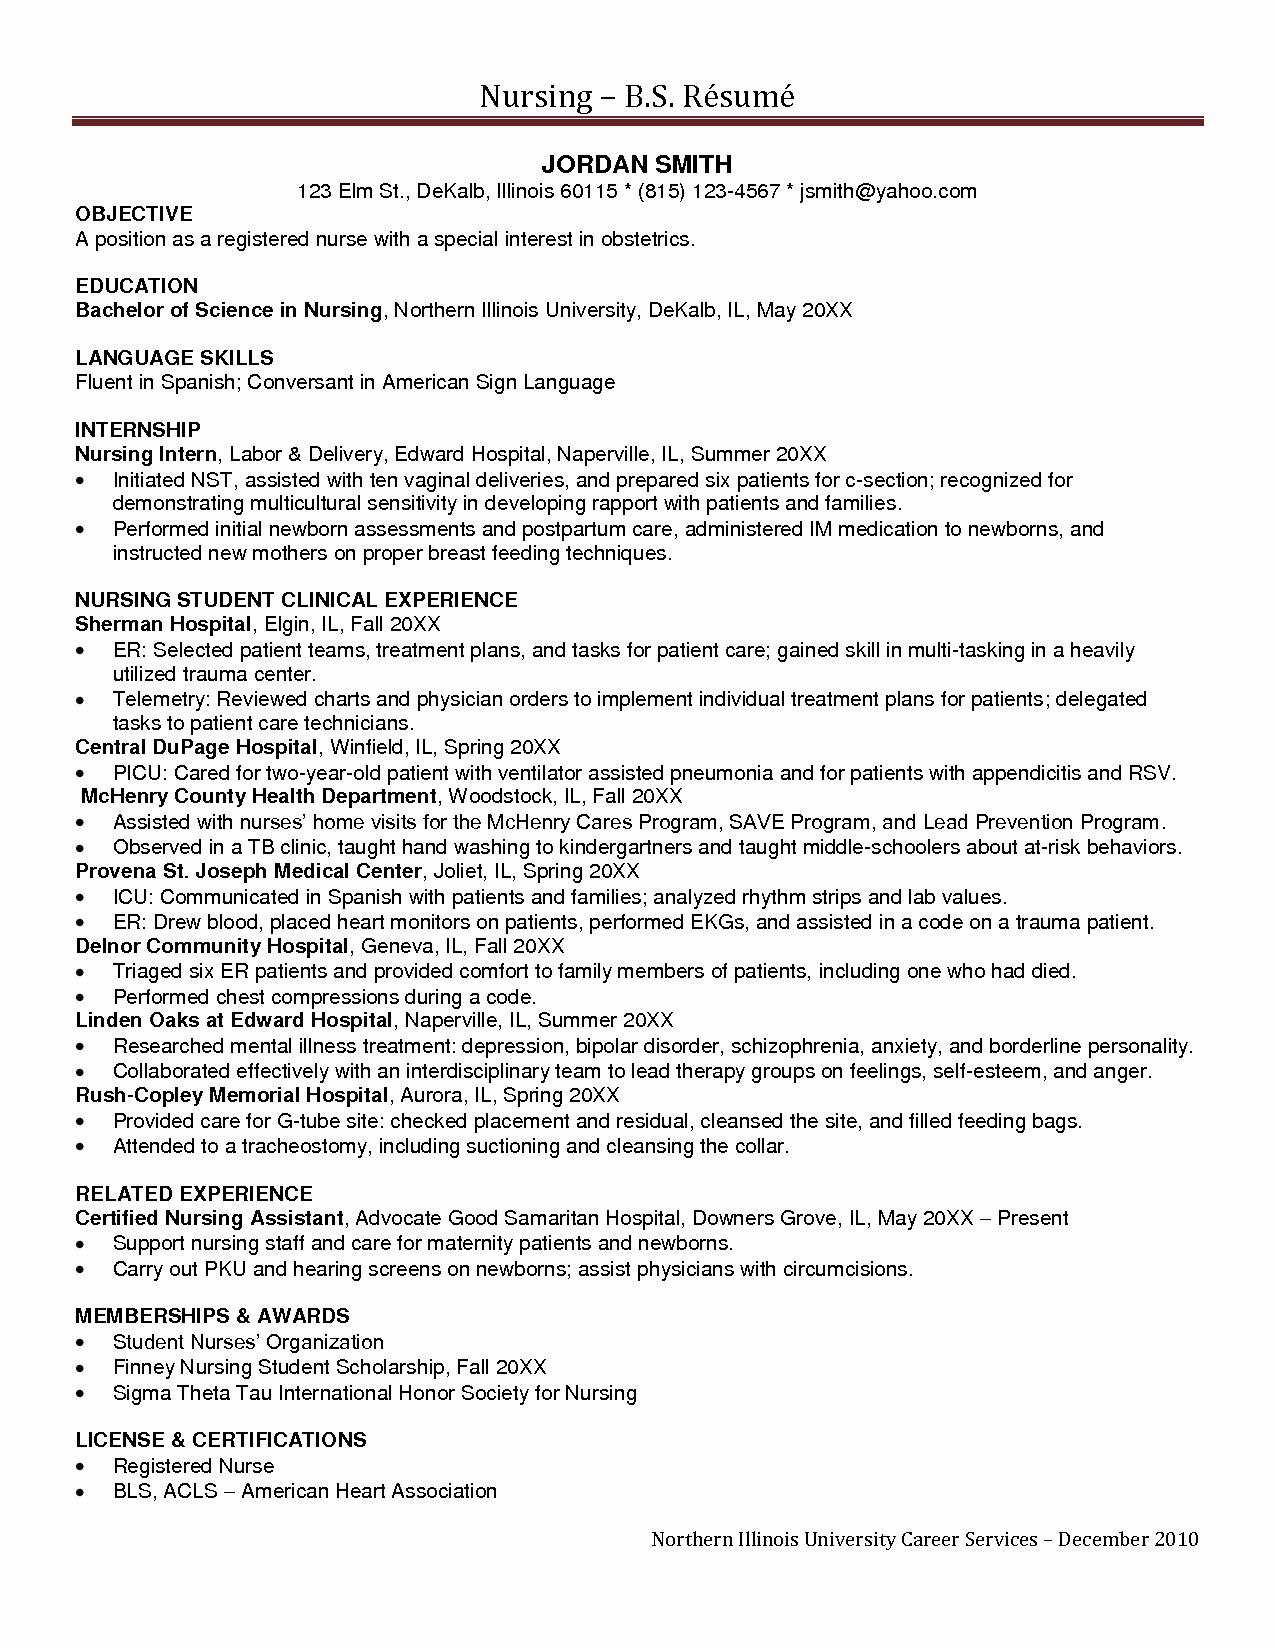 New Grad Rn Resume Objective Sidemcicek